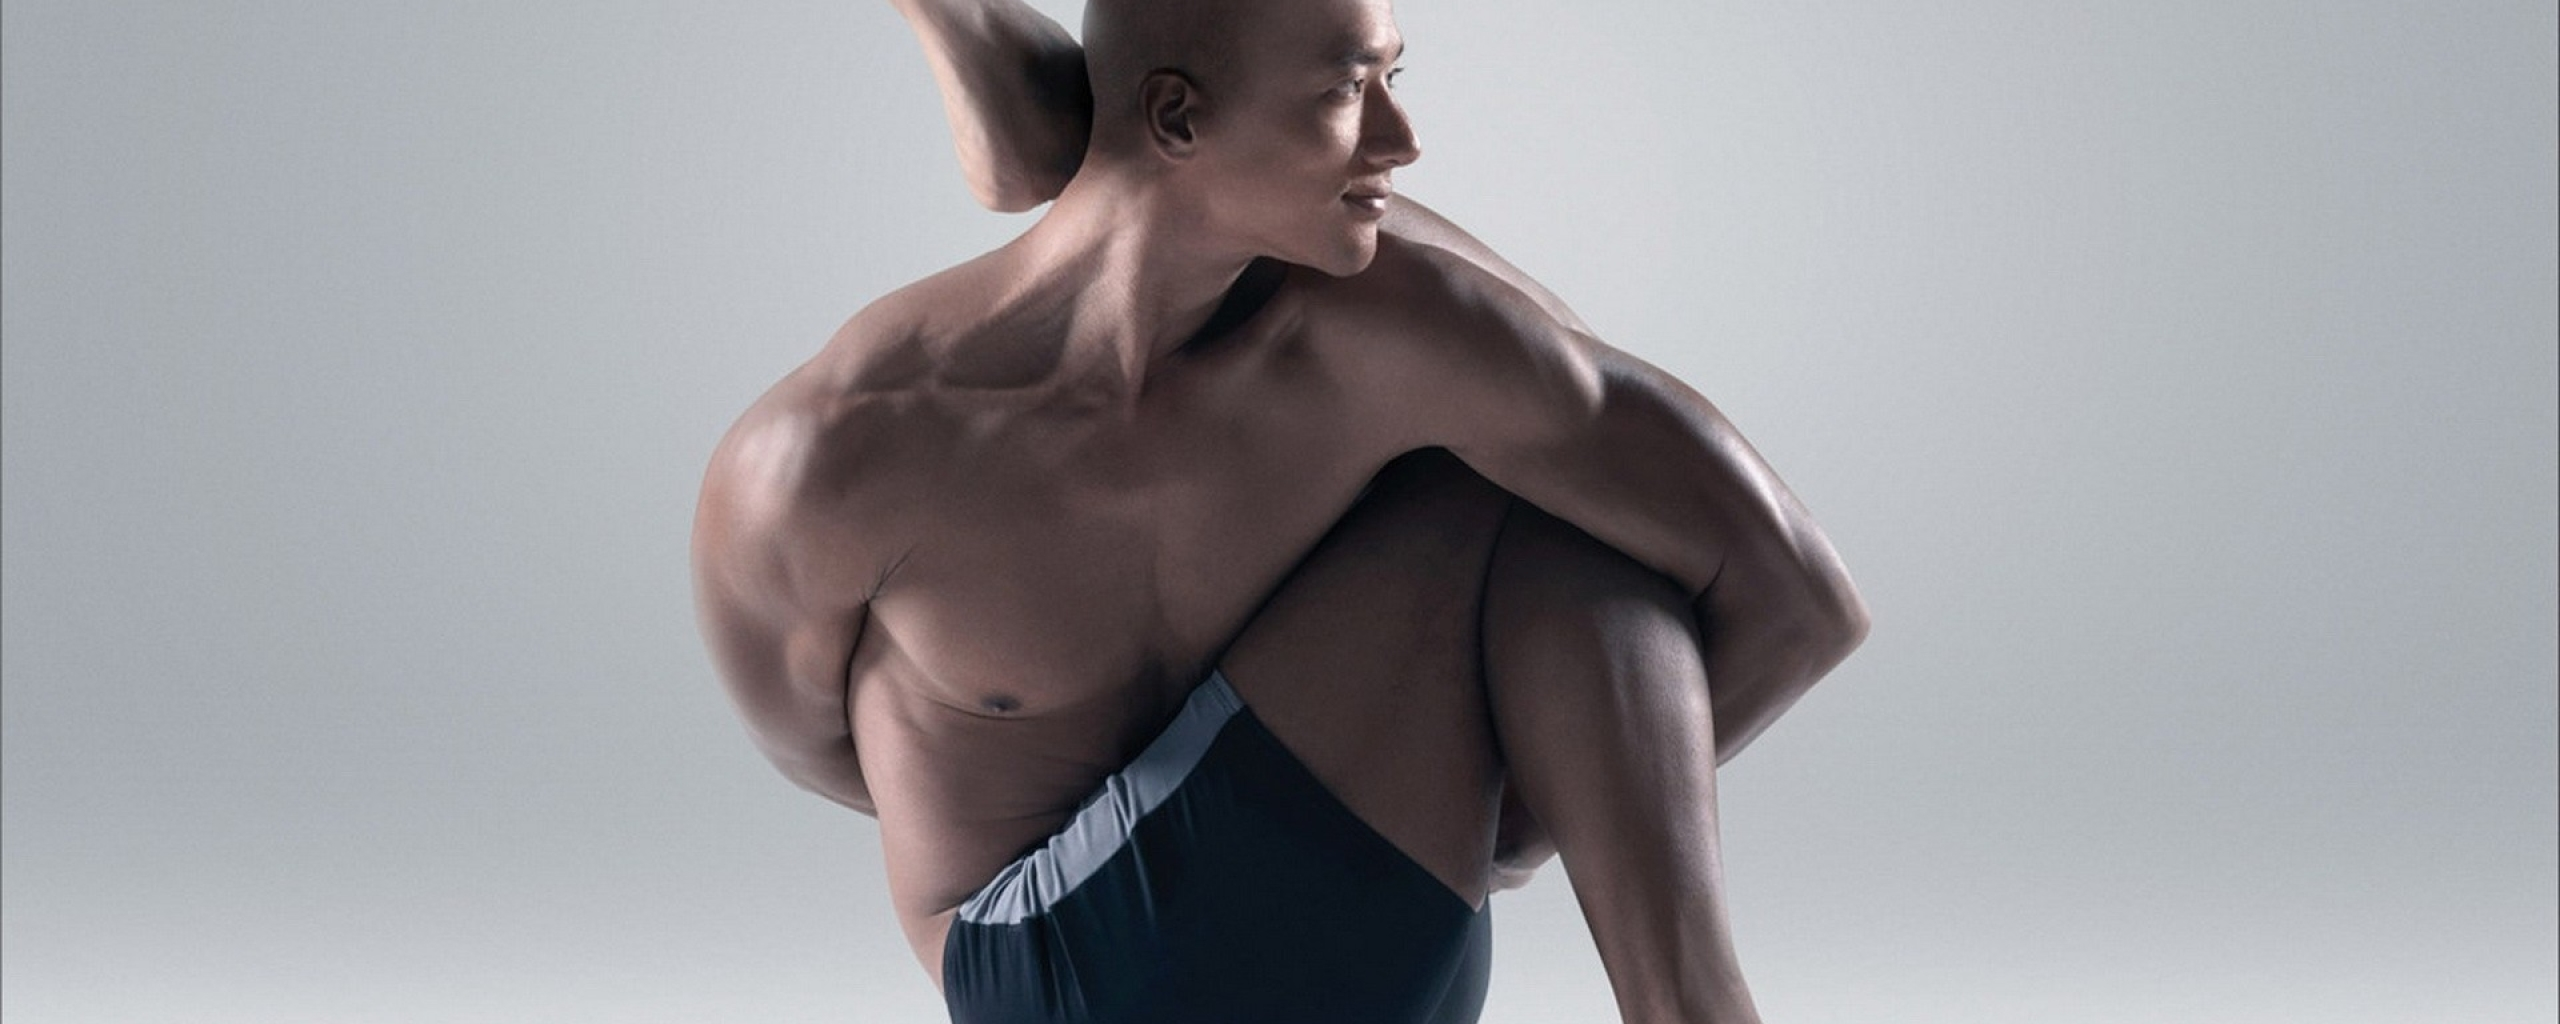 Yoga, Twisting, Man, Full HD Wallpaper  Yoga, Twisting,...